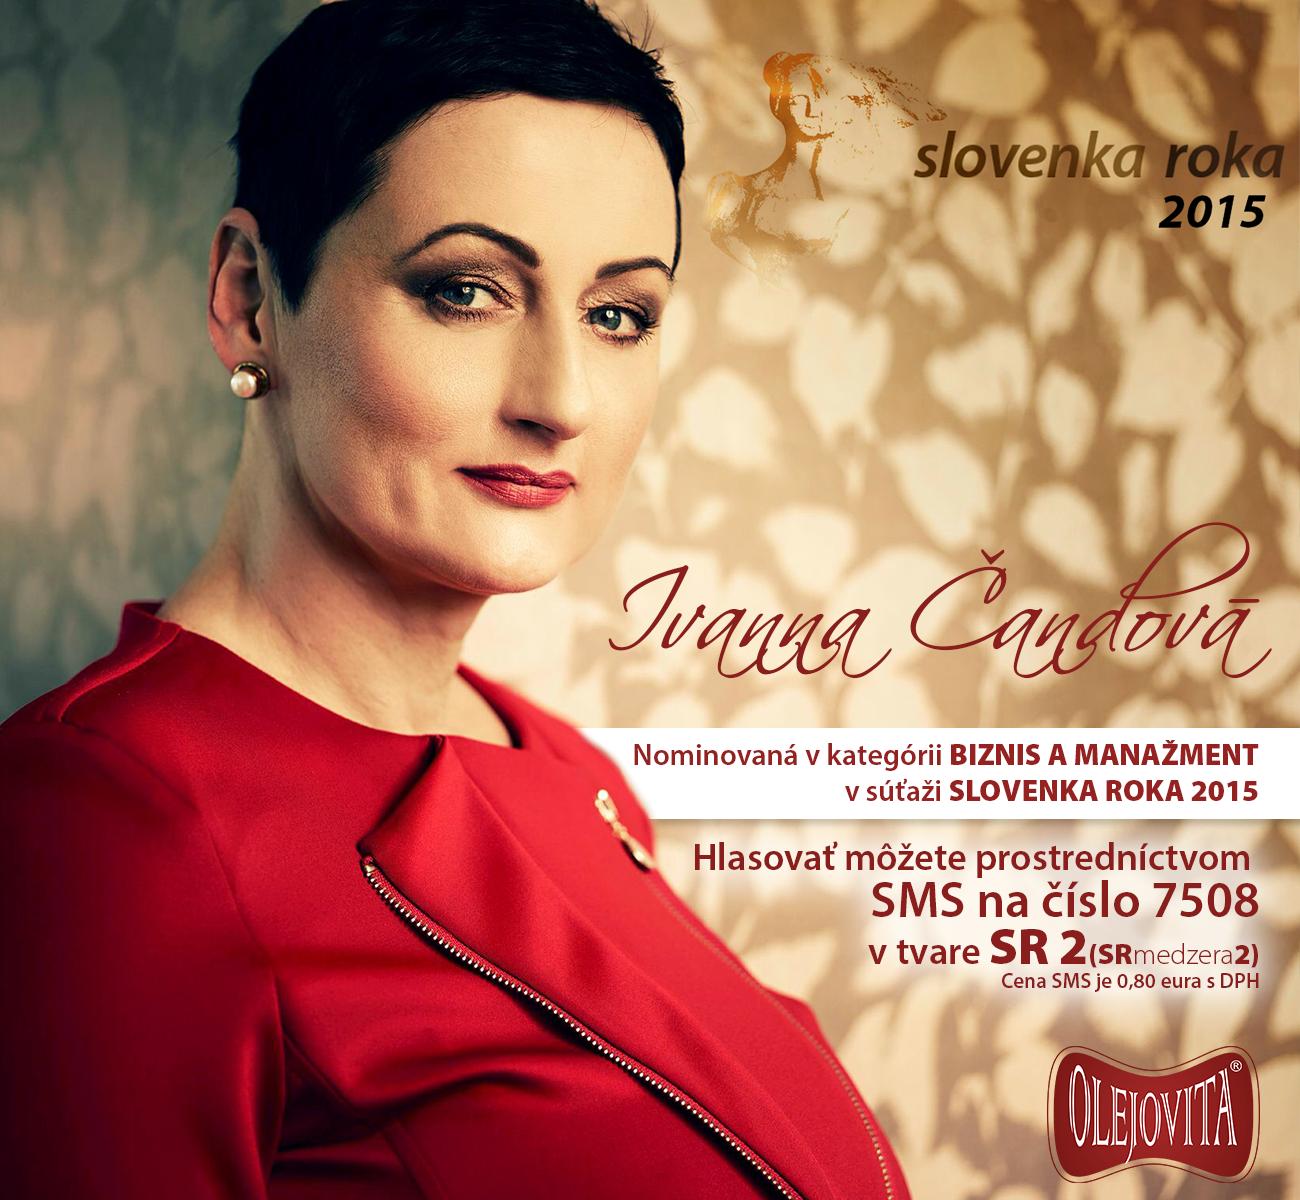 Ivanna Čandová